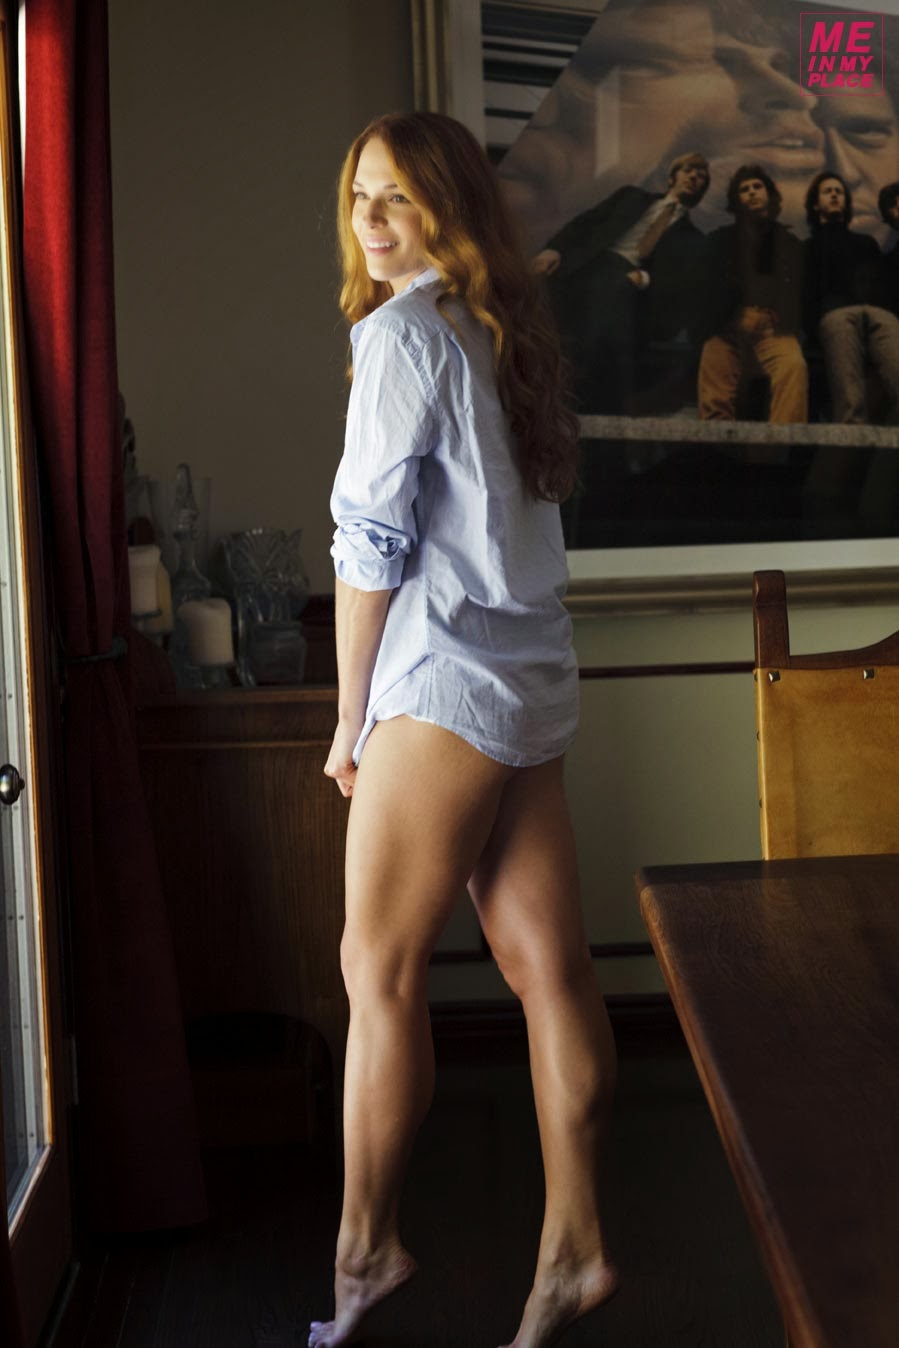 Her Calves Muscle Legs: Amanda Righetti Legs update - part 2